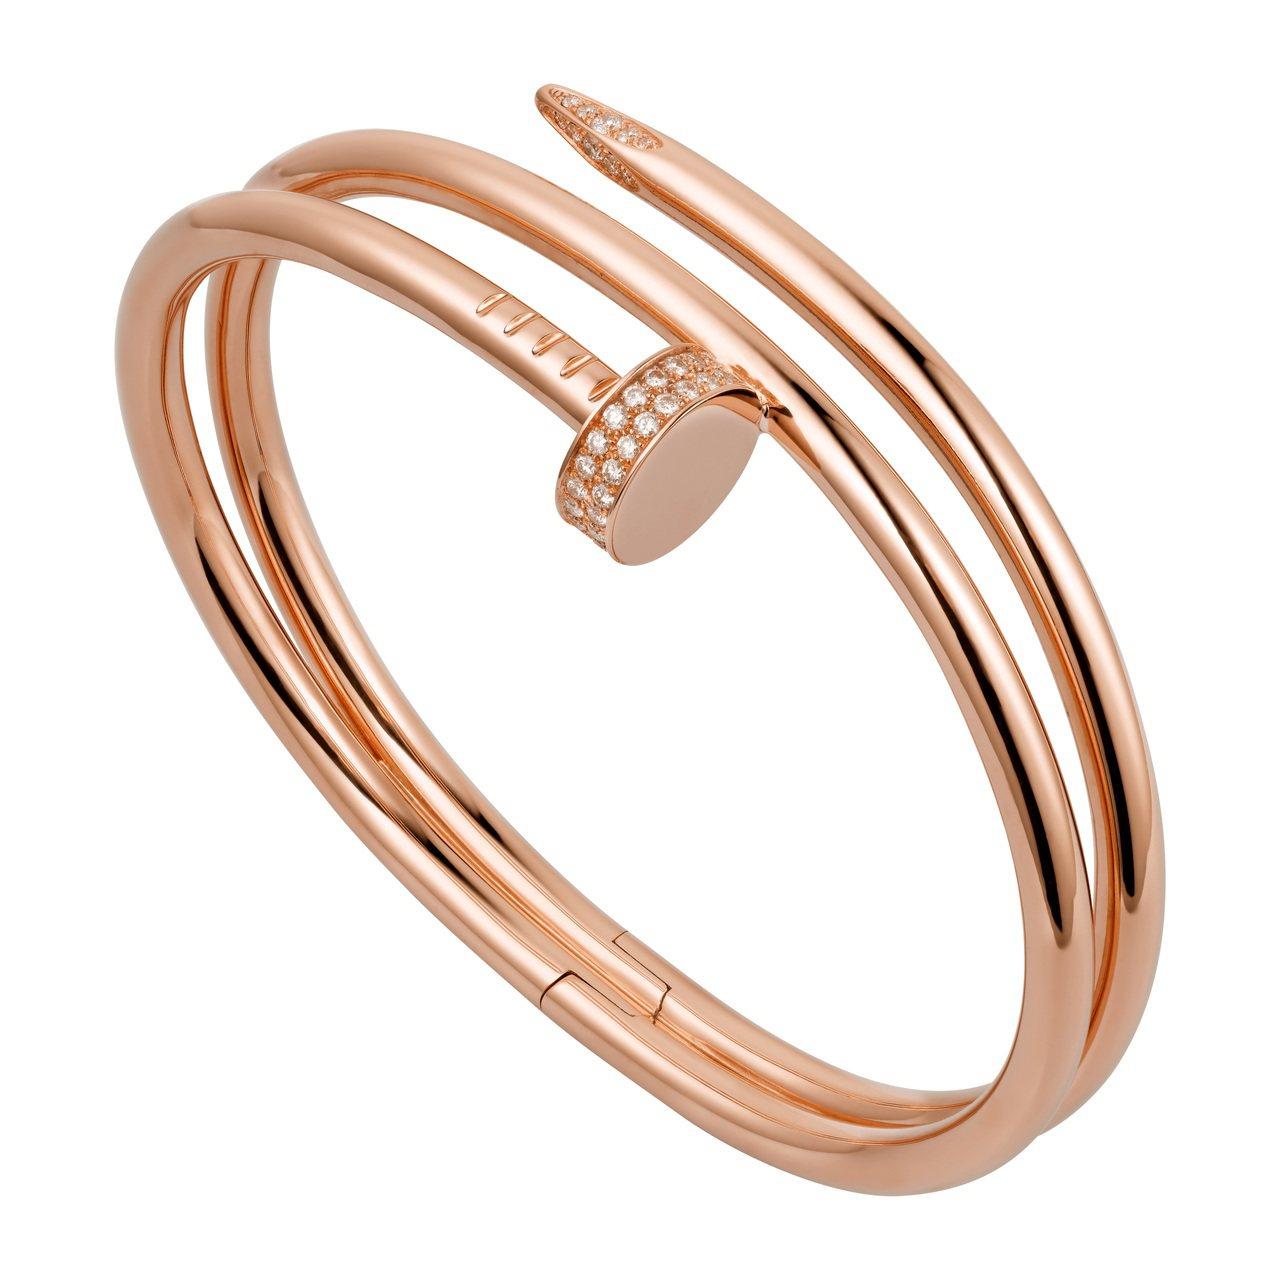 Juste un Clou系列玫瑰金鑲鑽手環,65萬元。圖/卡地亞提供